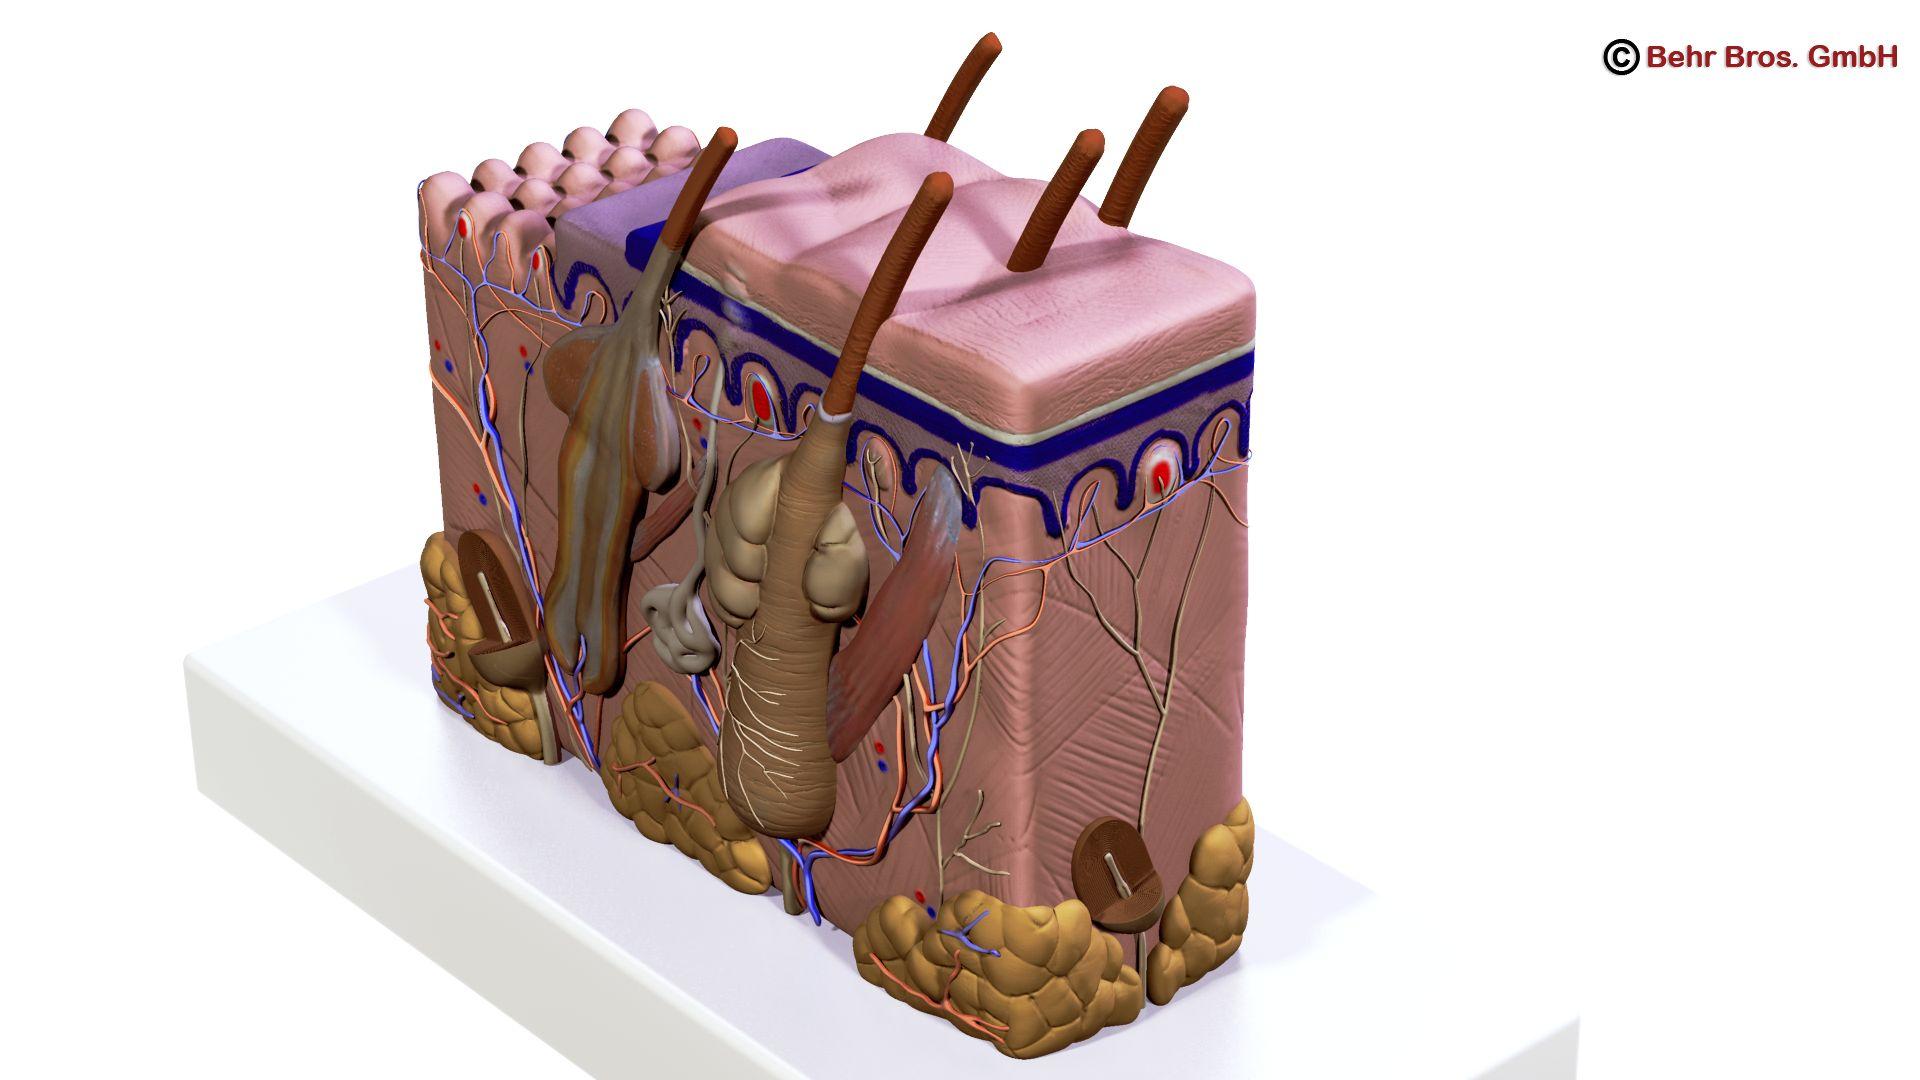 Human Skin Section 3d model 3ds max fbx c4d lwo lws lw ma mb obj 161728